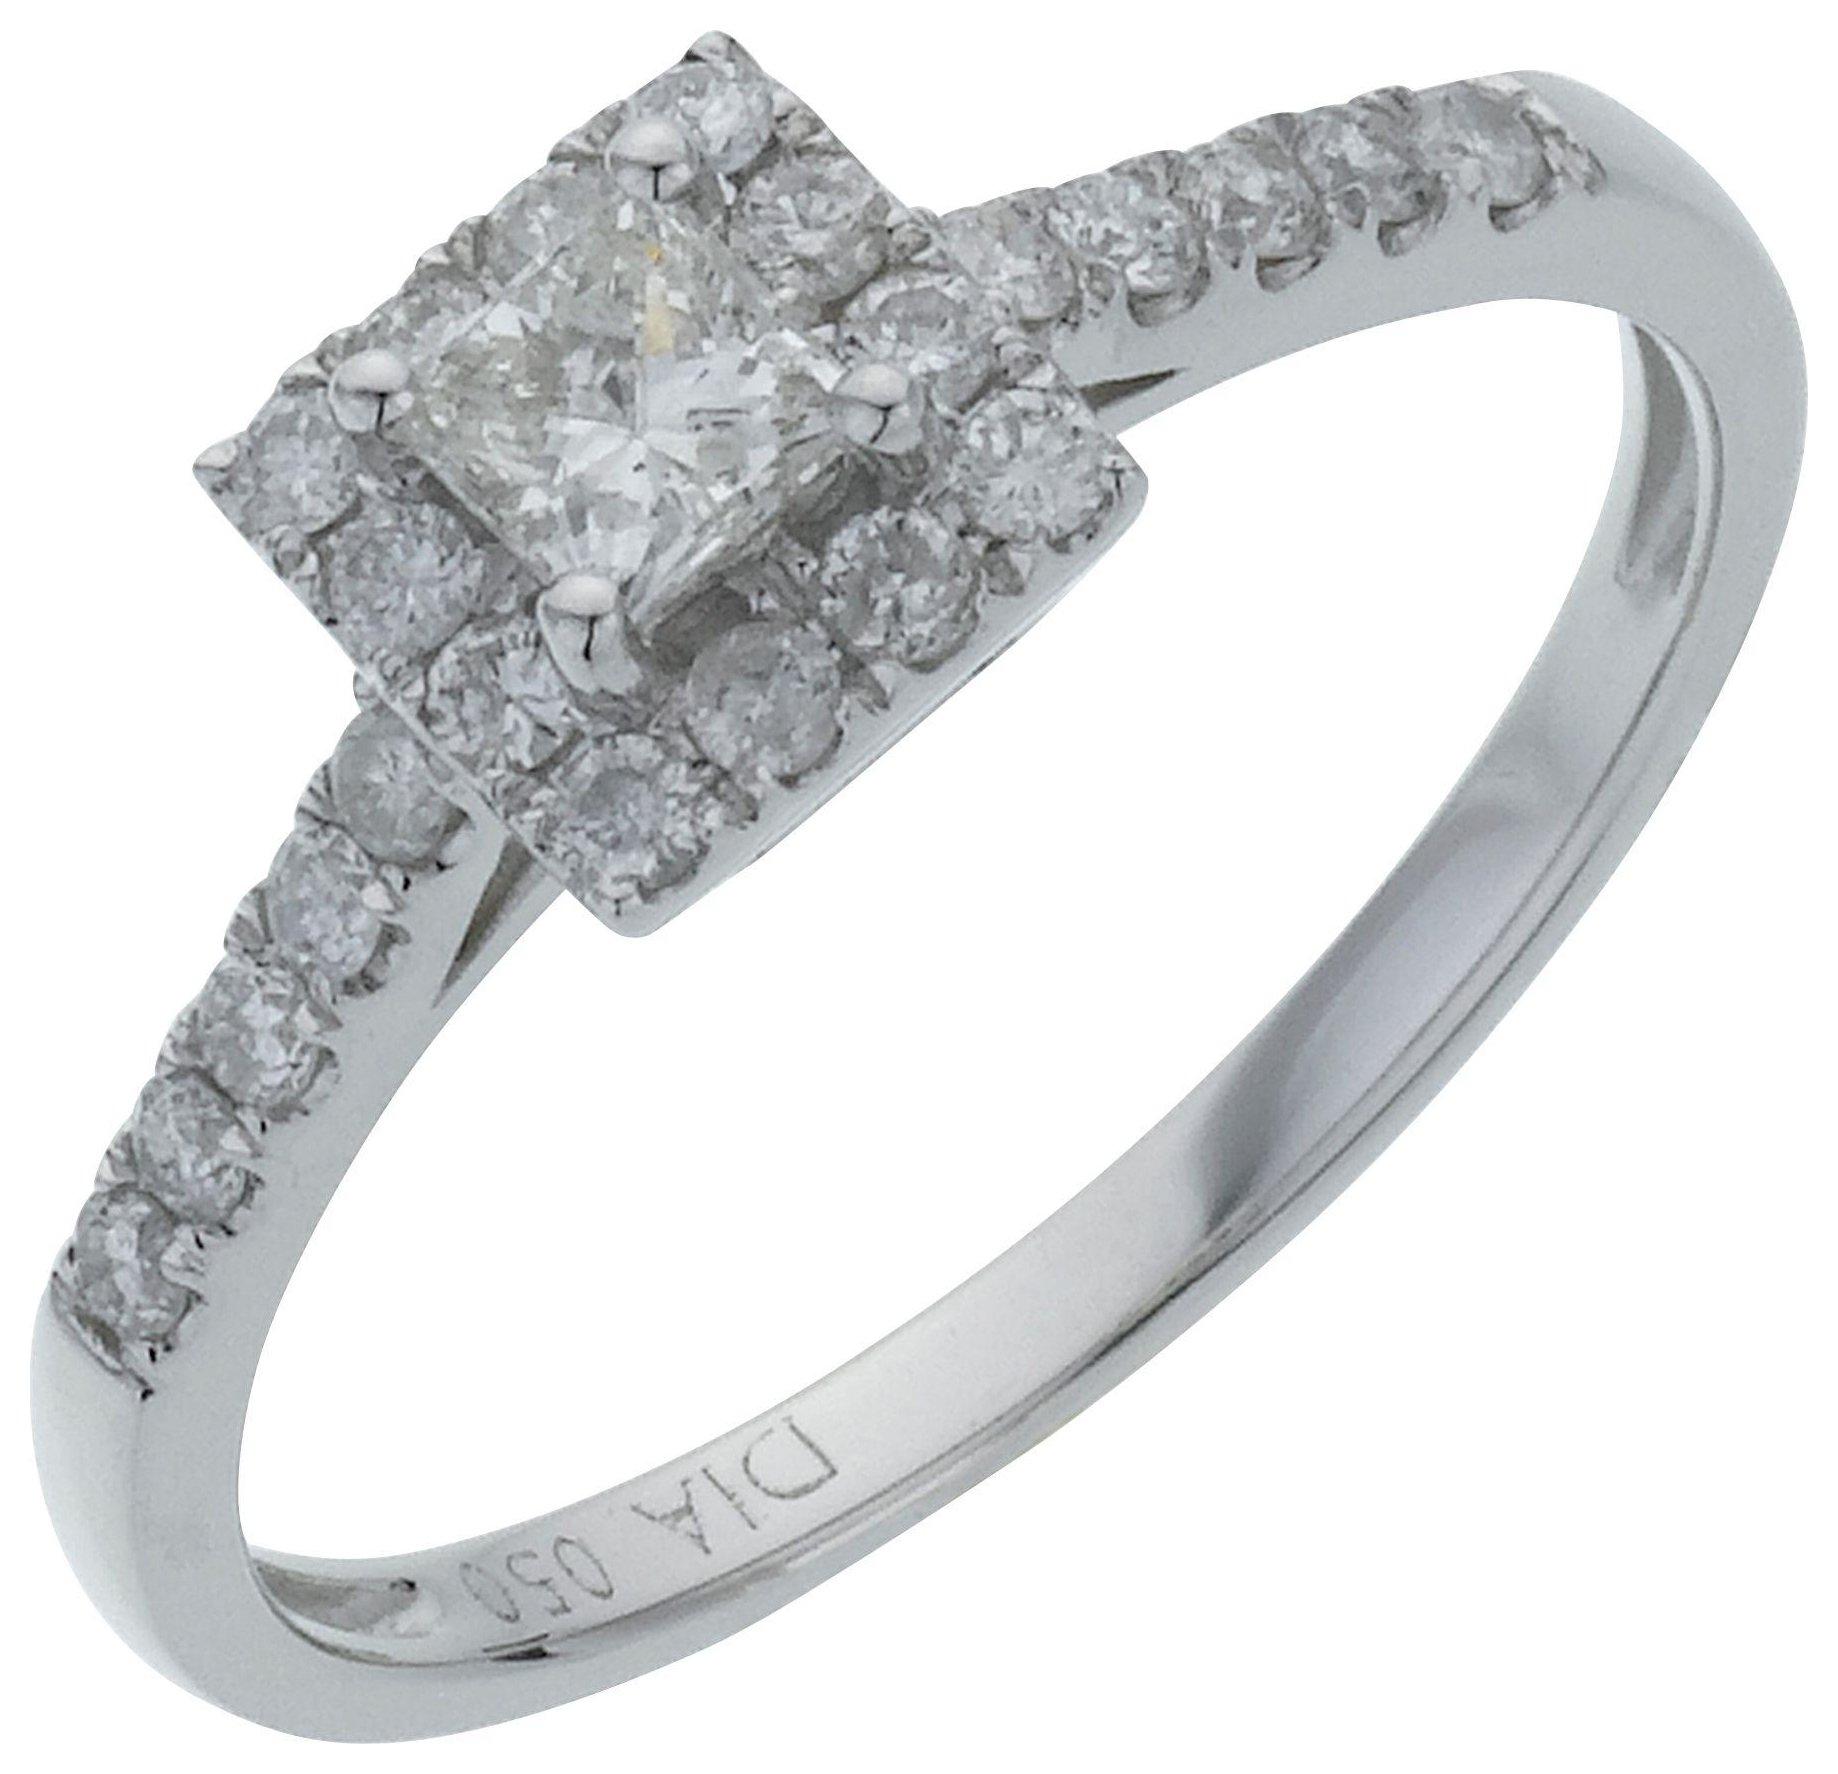 18 Carat White Gold Square Diamond - Halo Ring - Size W